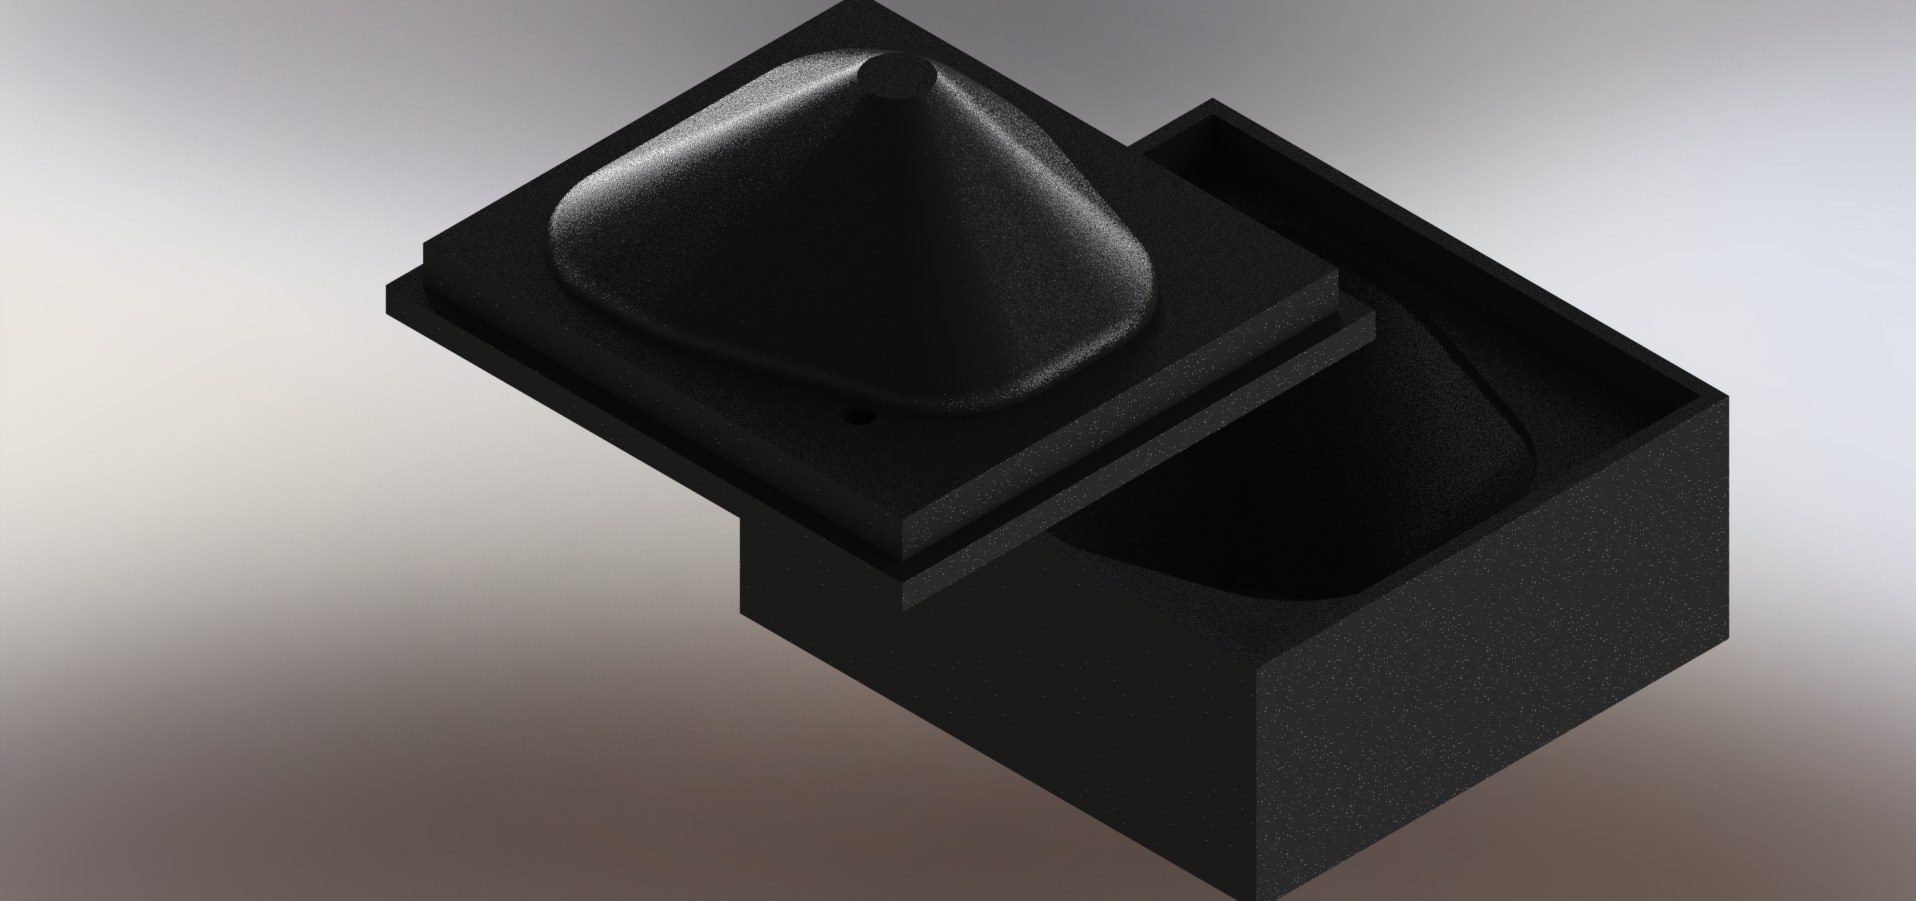 Isometric view of mold2.JPG